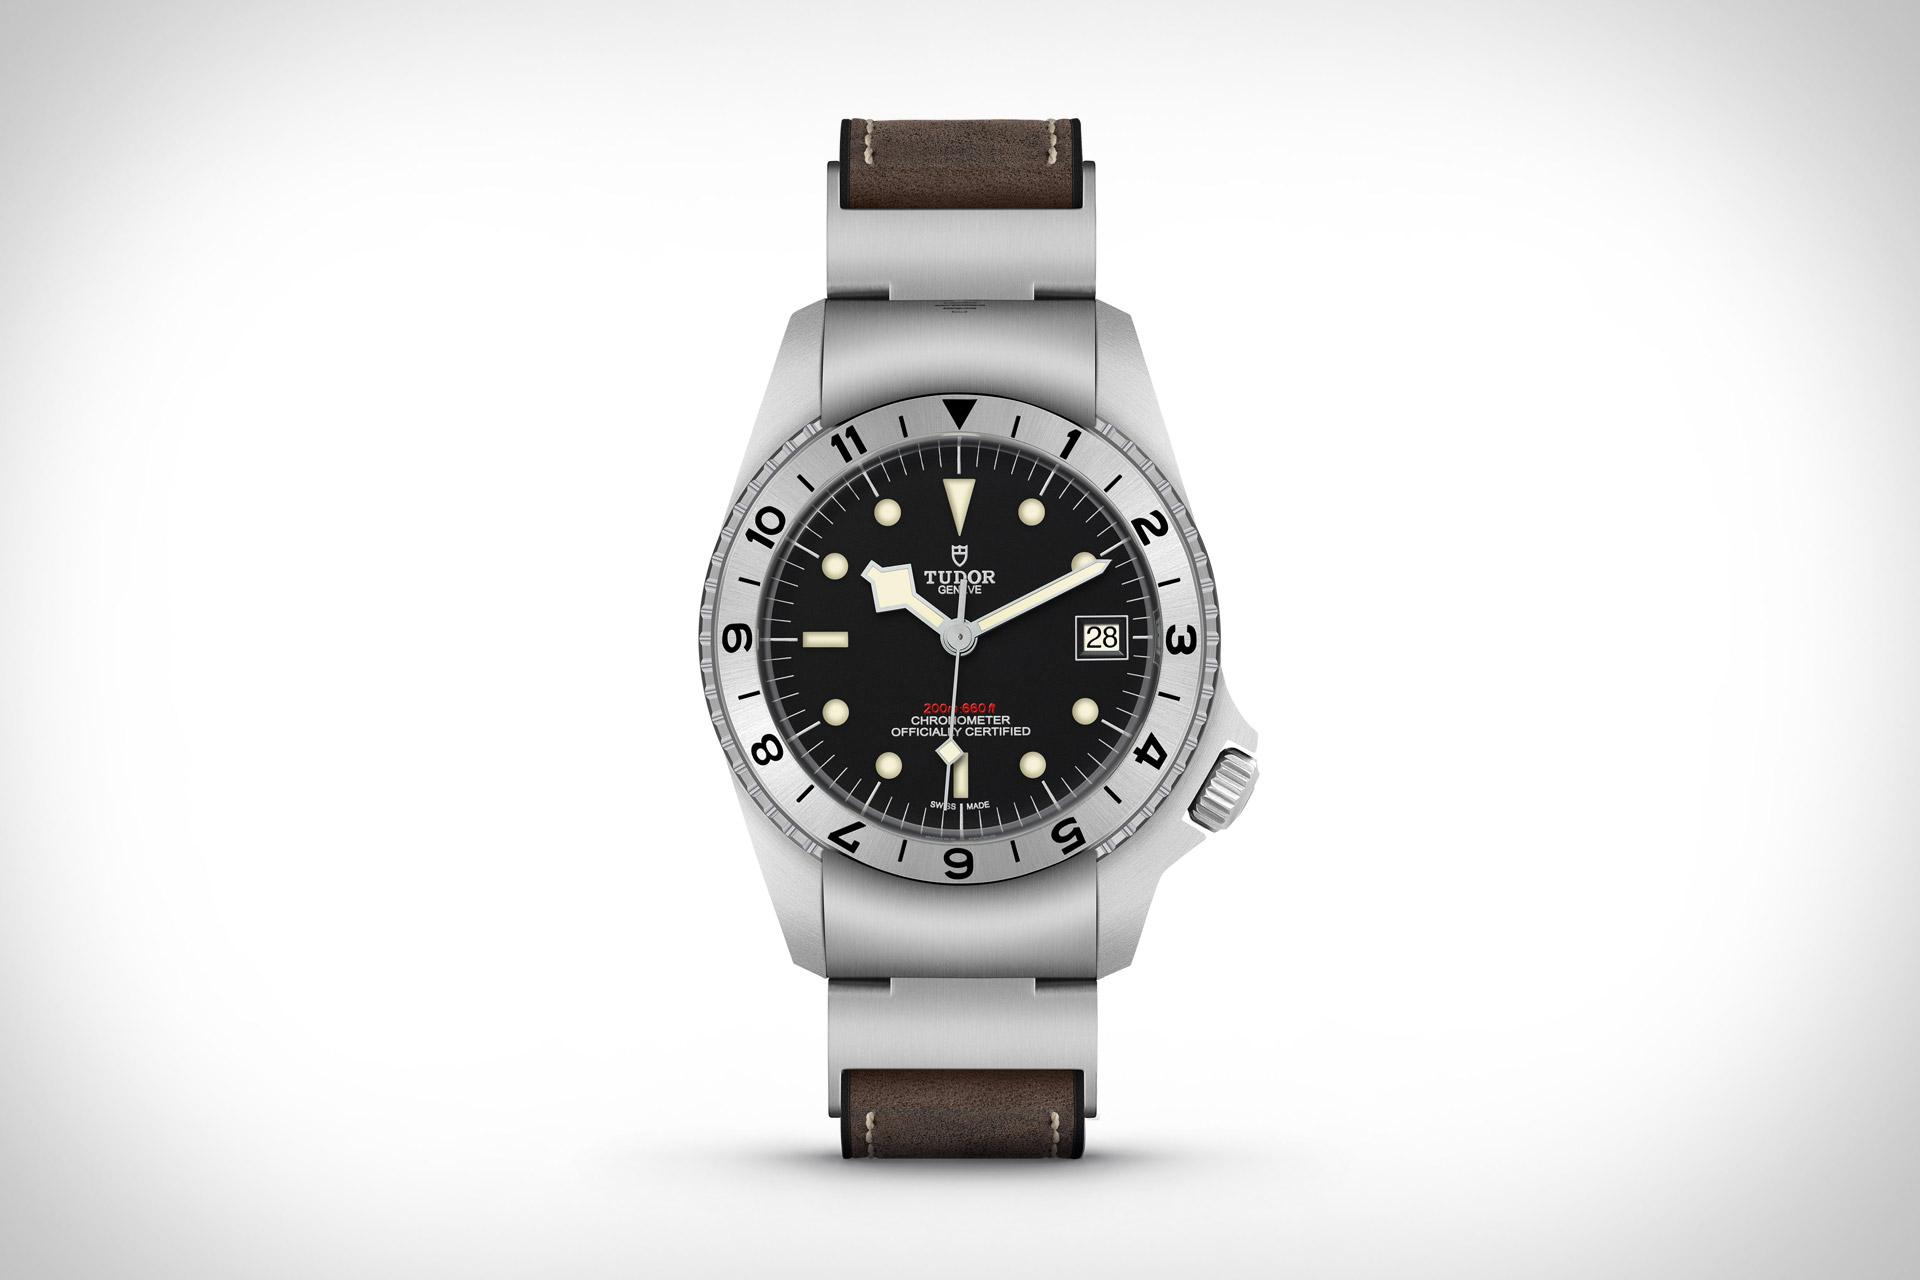 Tudor Black Bay P01 Watch